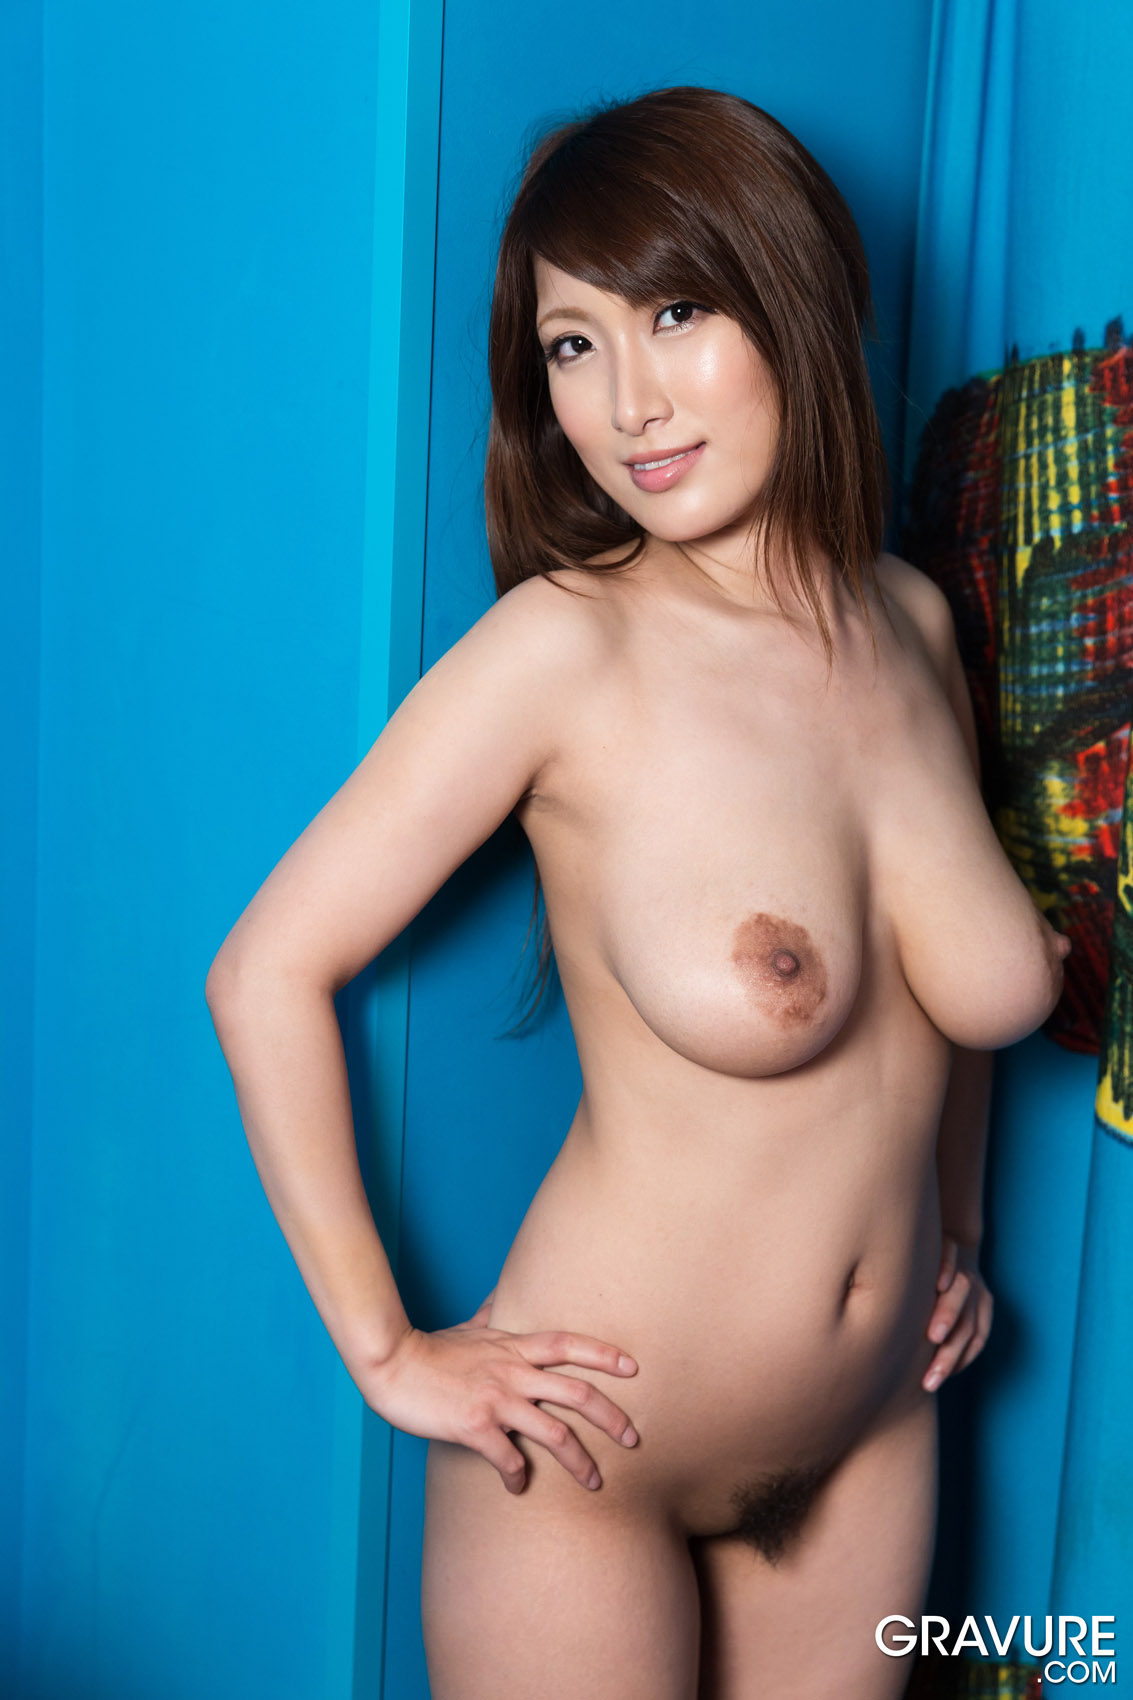 gravure idol nude Japanese